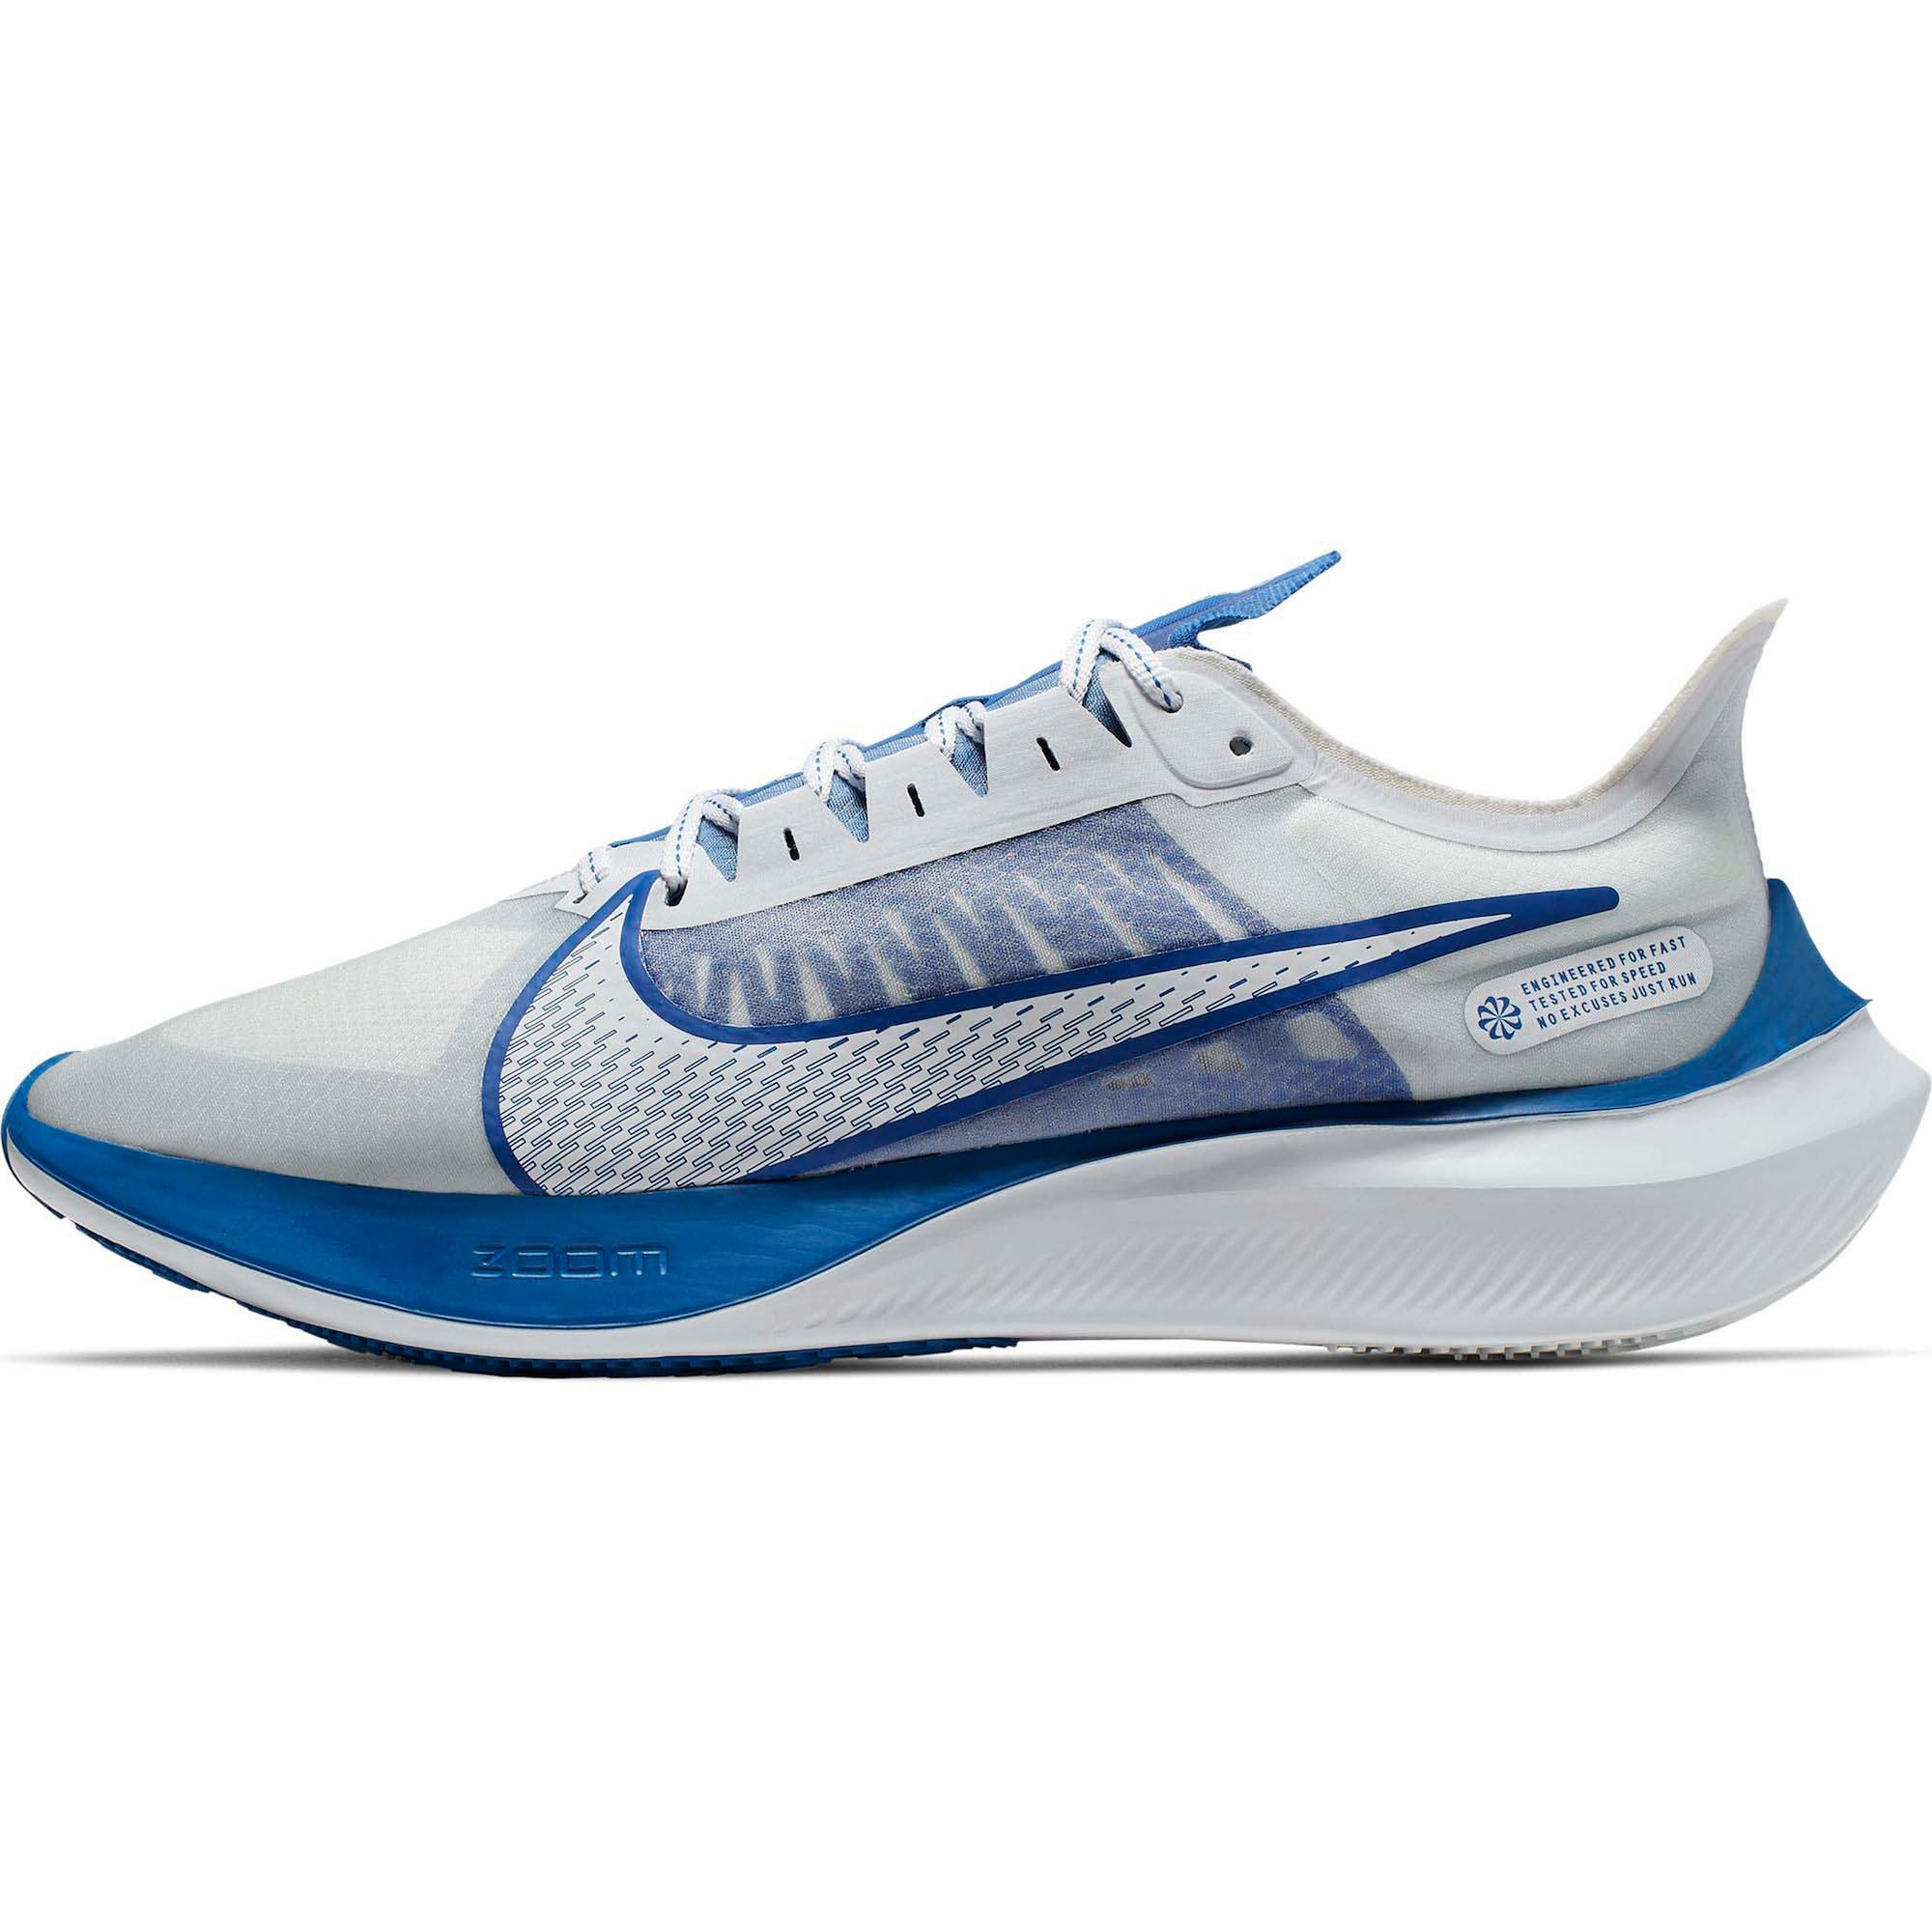 Laufschuhe 'Zoom Gravity' | Schuhe > Sportschuhe > Laufschuhe | Nike